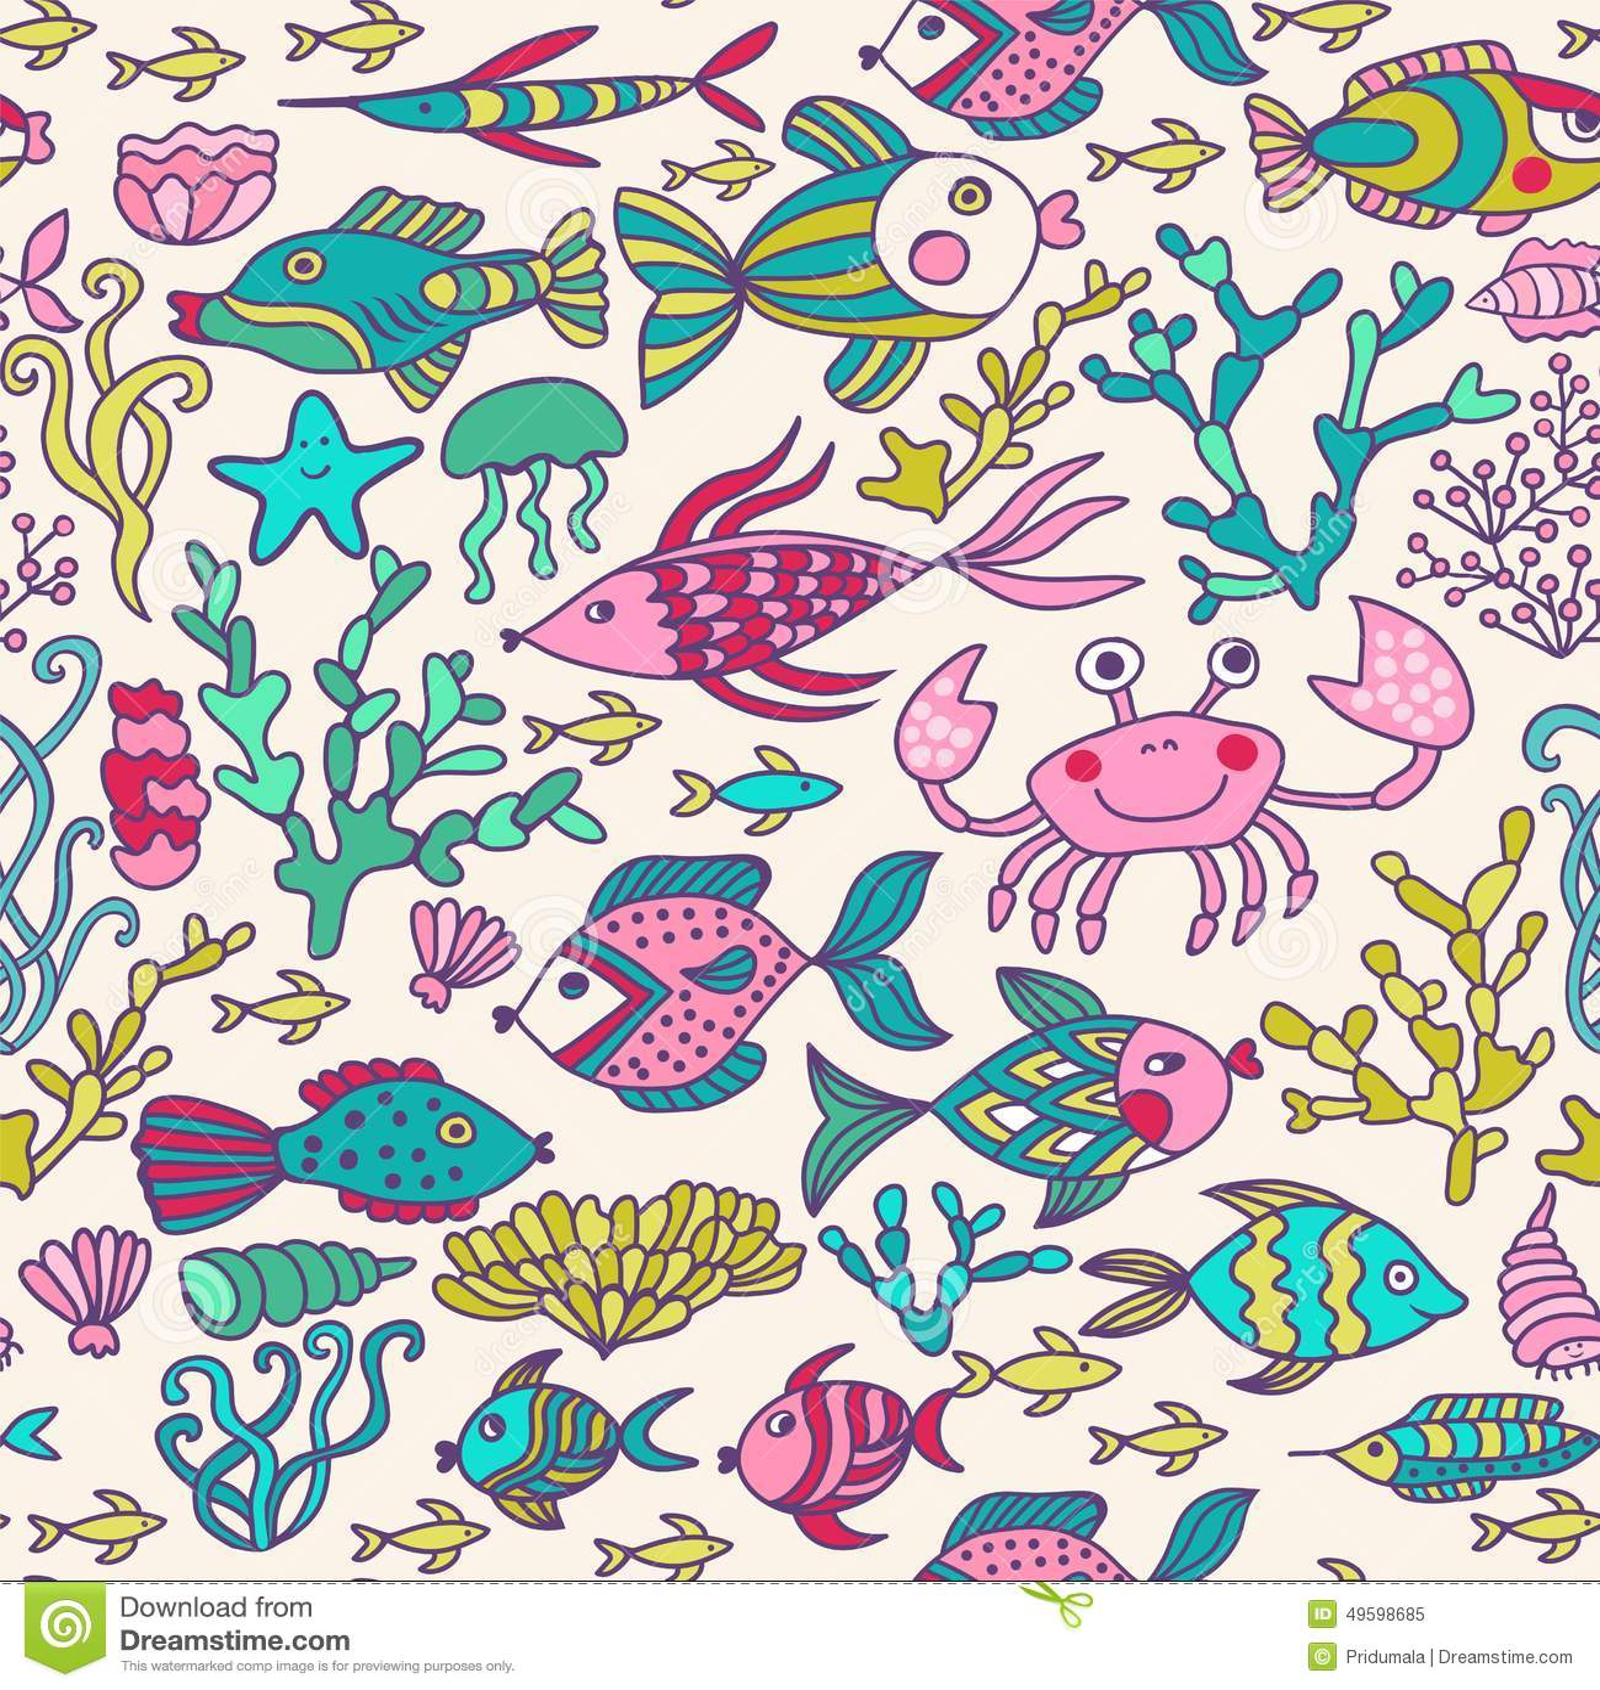 ocean fish wallpaper pattern - photo #22